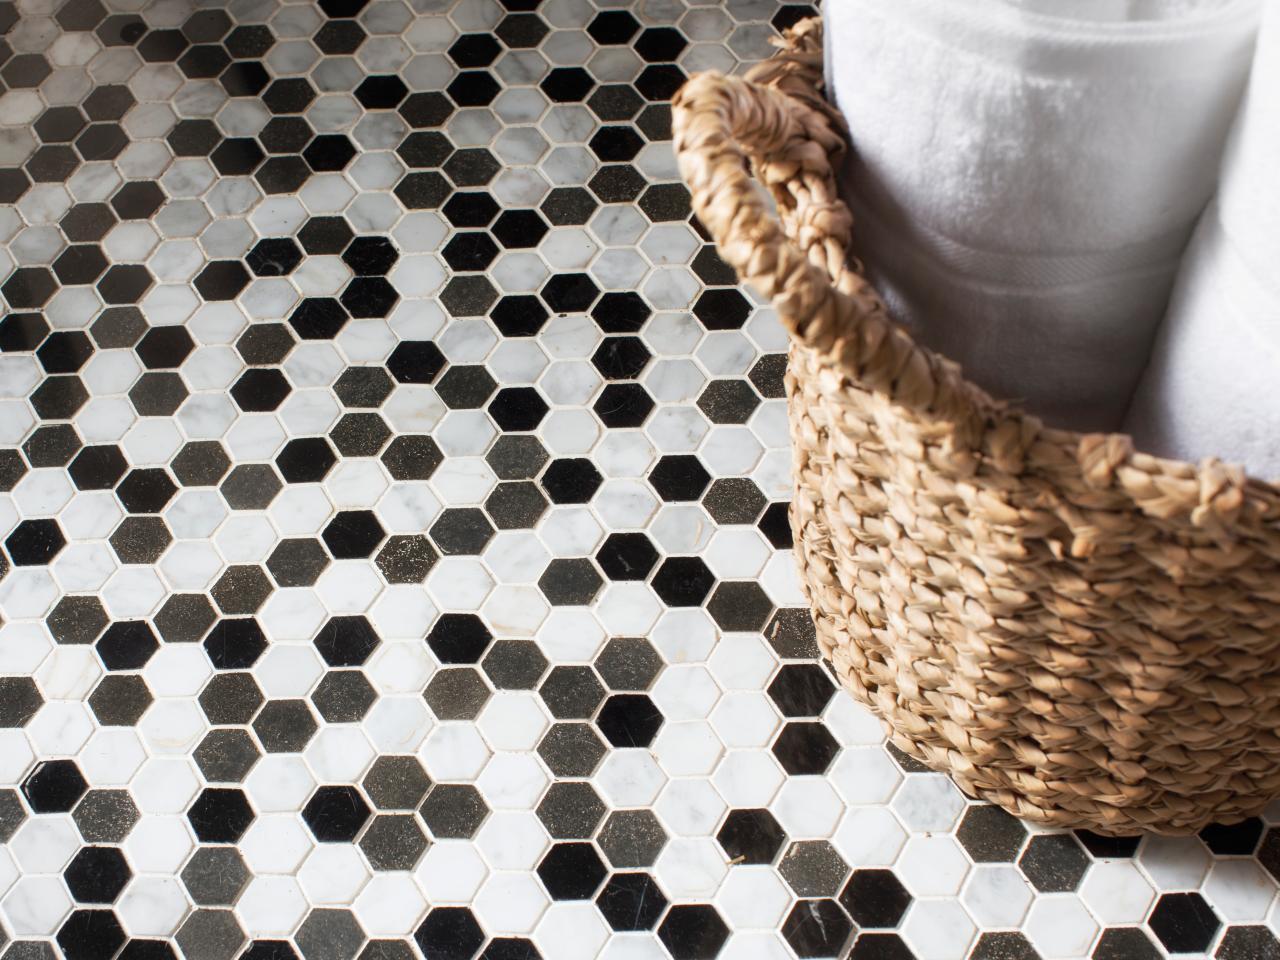 Original_Brian-Patrick-Flynn-hexagon-bathroom-tile_s4x3.jpg.rend.hgtvcom.1280.960